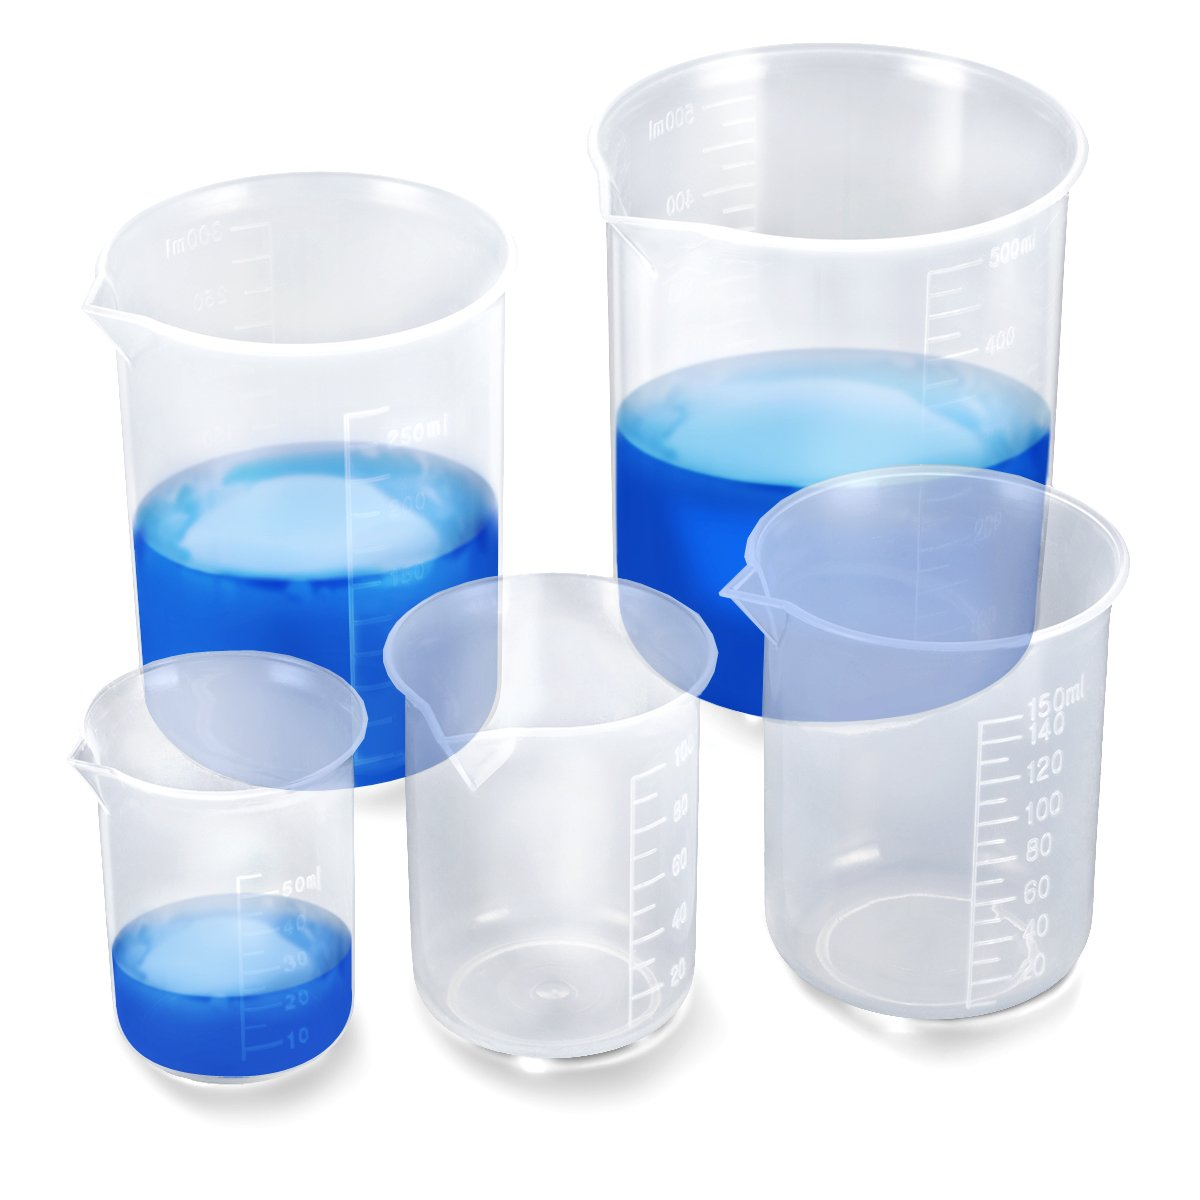 EFANTUR 5pcs Plastic Graduated Beakers 50ml 100ml 150ml 250ml 500ml(Transparent) tianjin boge kejiyouxiangongsi